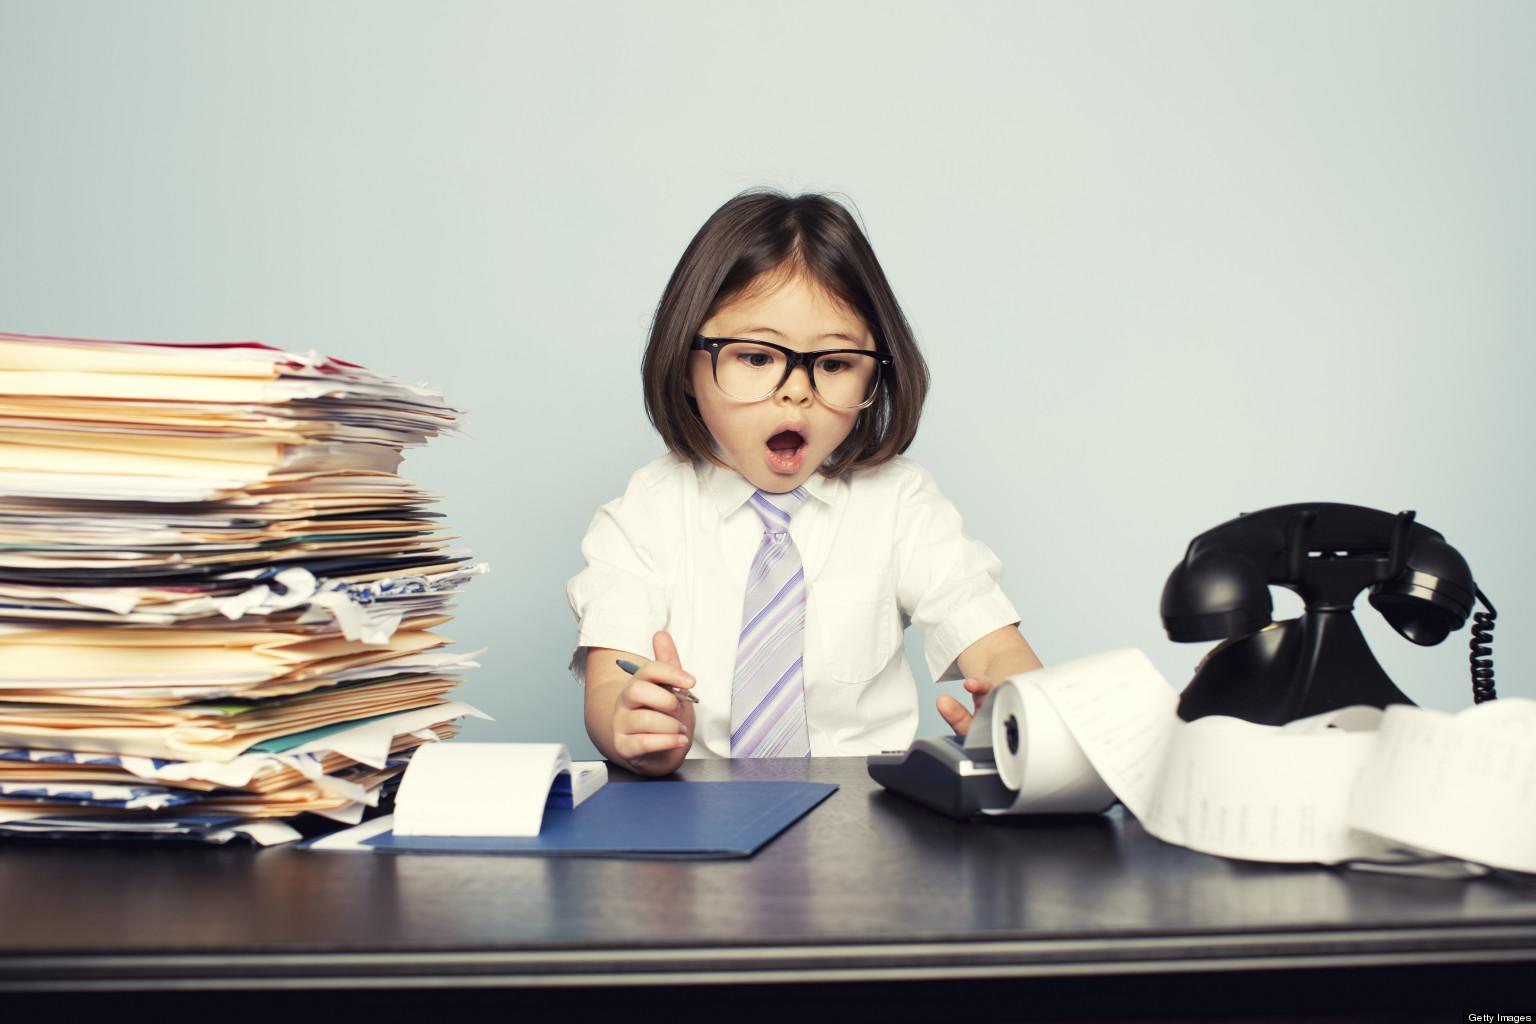 o-take-your-kids-to-work-day-facebook.jpg